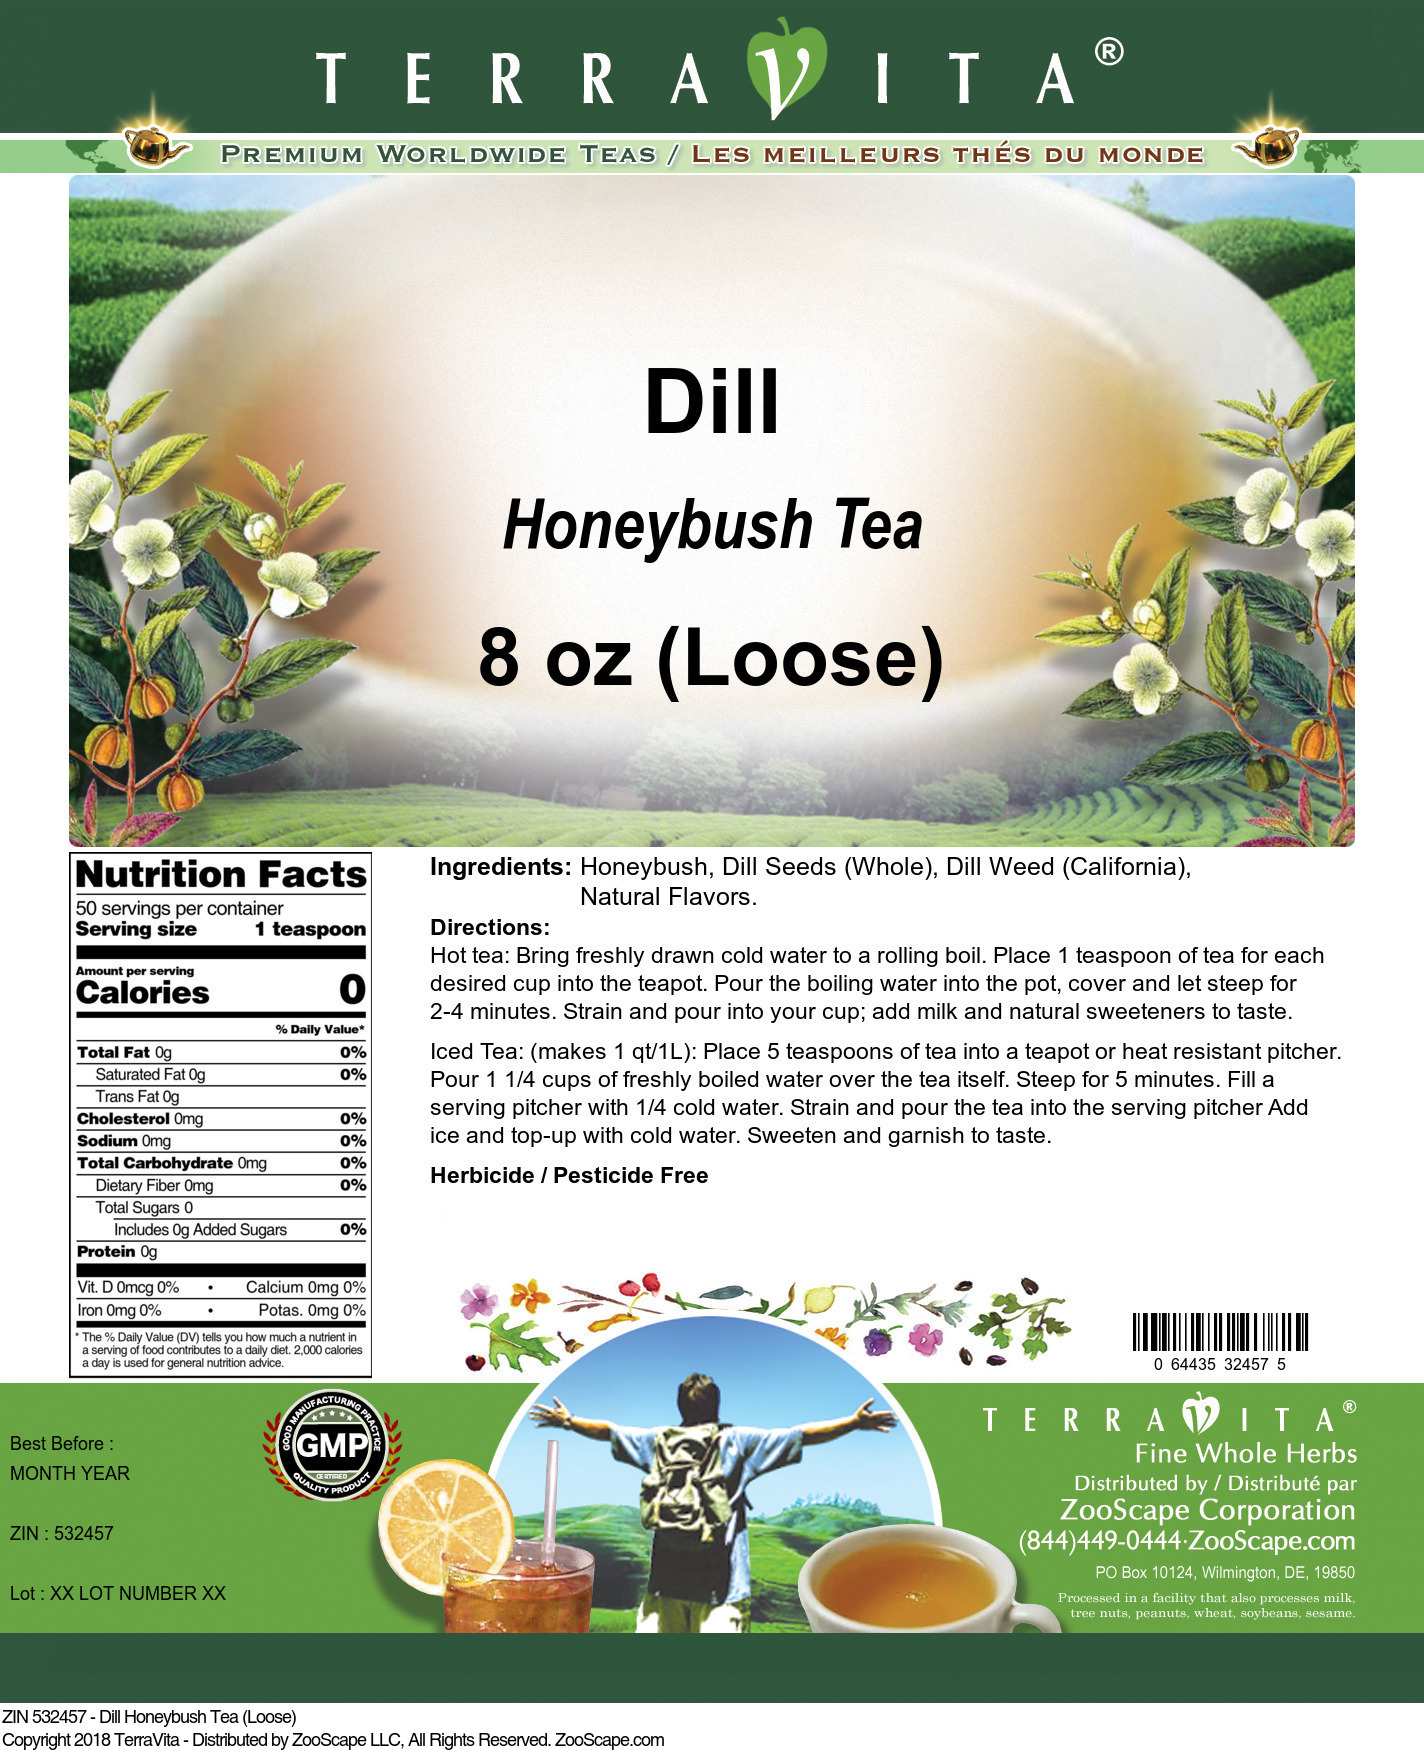 Dill Honeybush Tea (Loose)